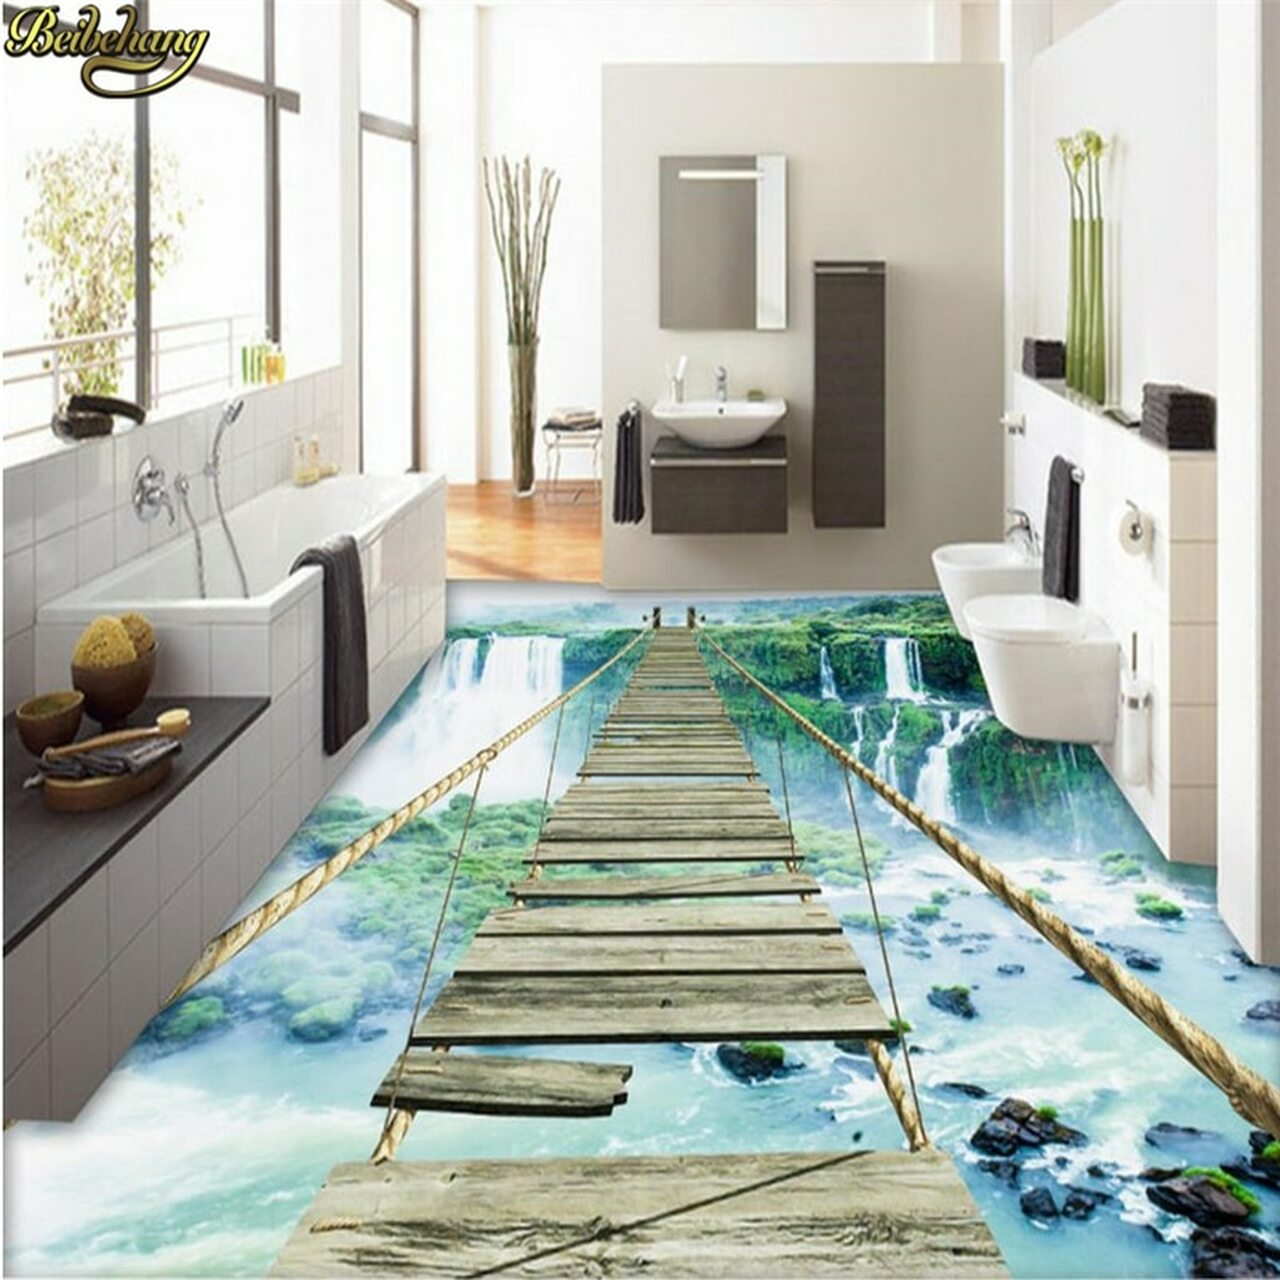 Custom Photo Wallpaper Floor Paintings Sticky Landscape Waterfall Adventure Rope Wooden Bridge 3d Floor